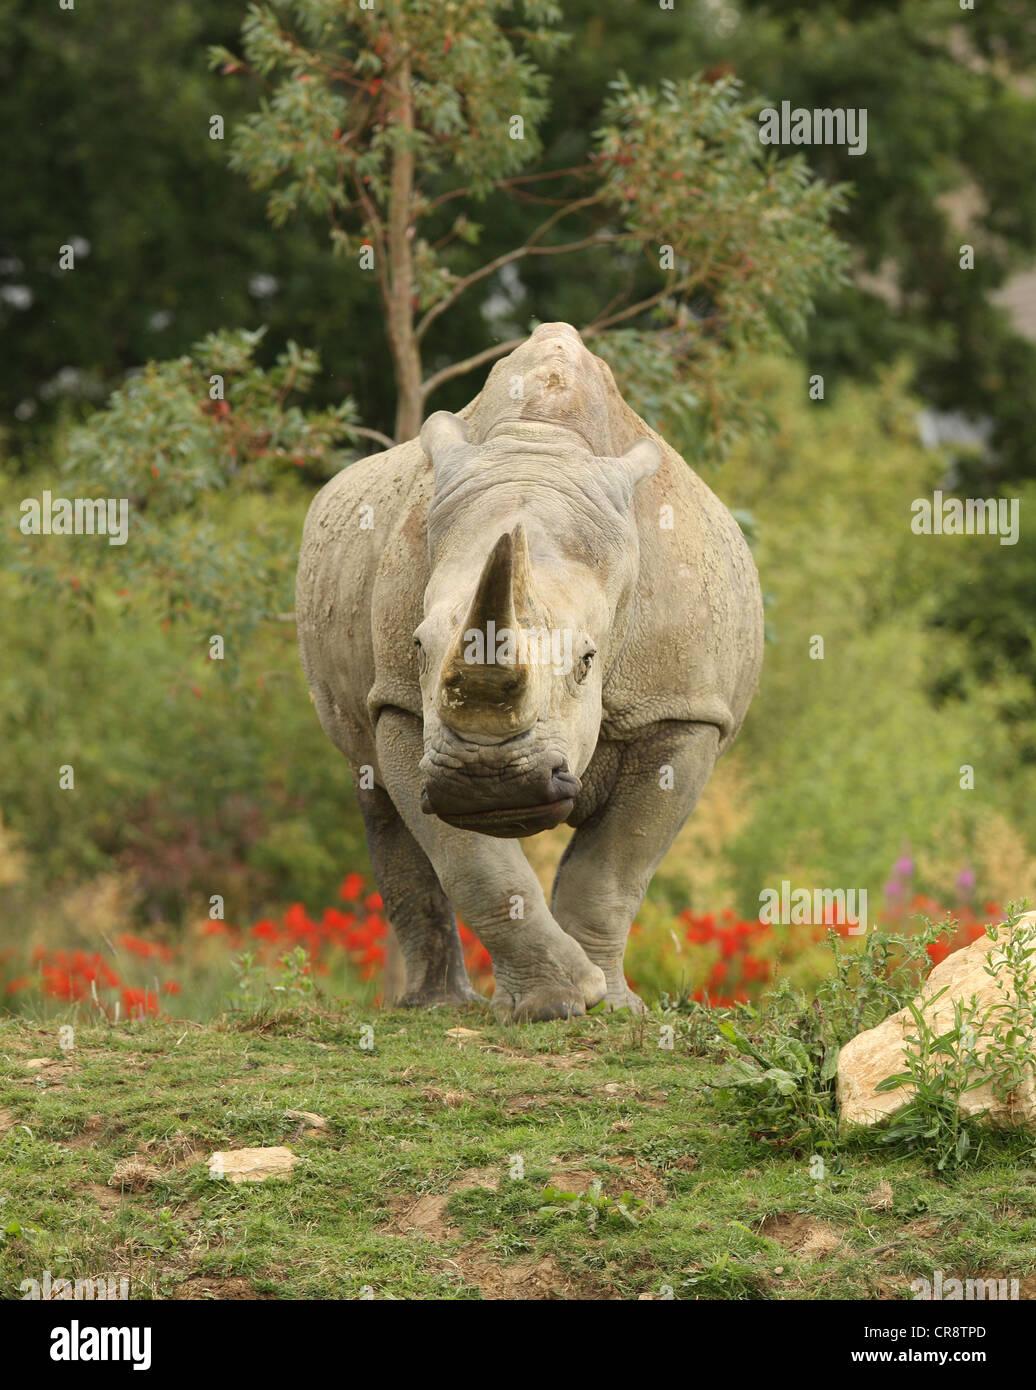 A White Rhino charging - Stock Image